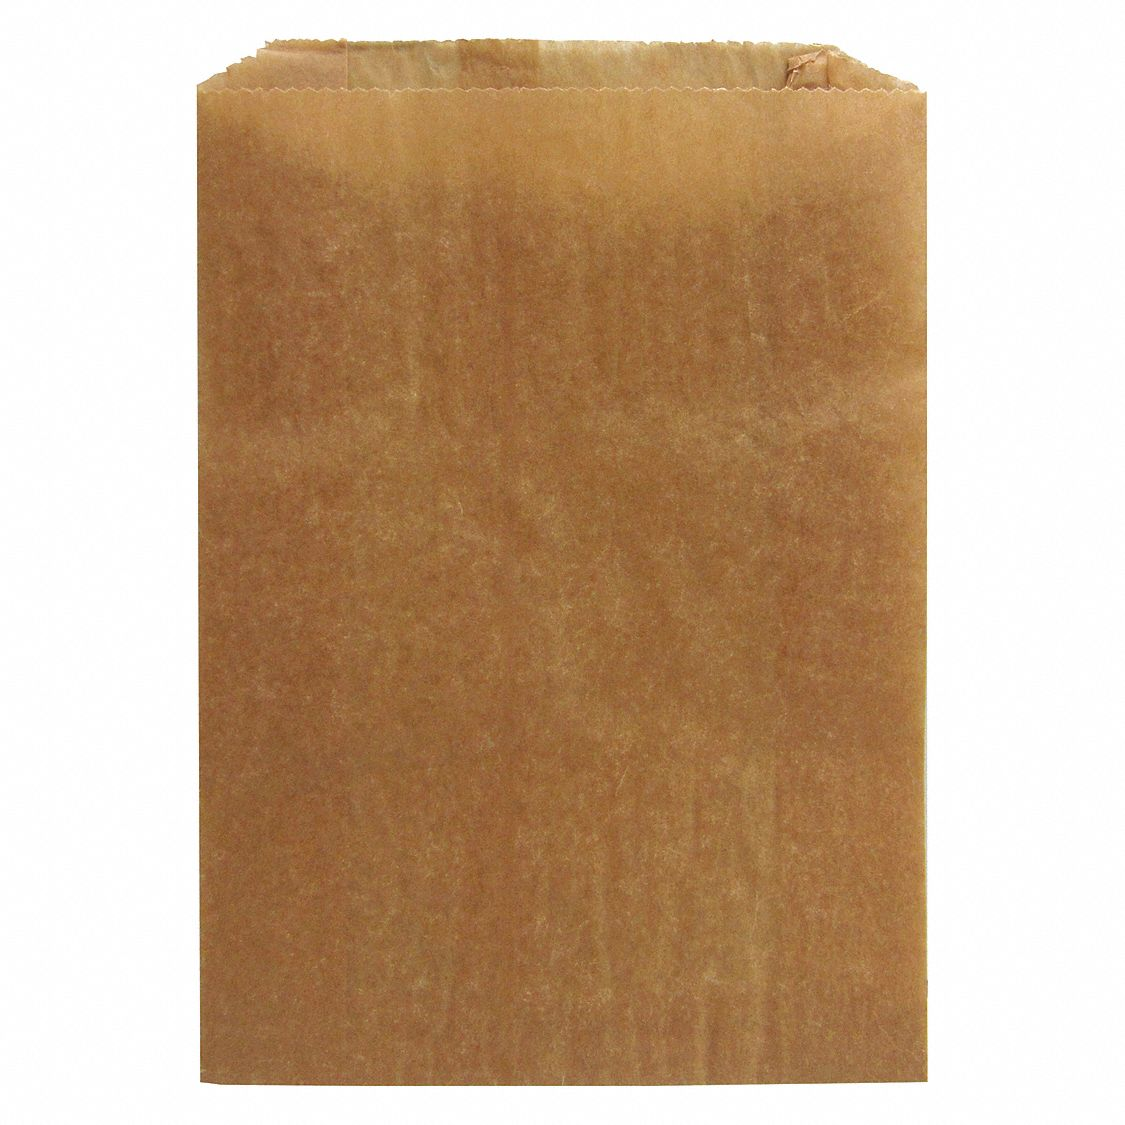 Sanitary Napkin Disposal Grainger Industrial Supply